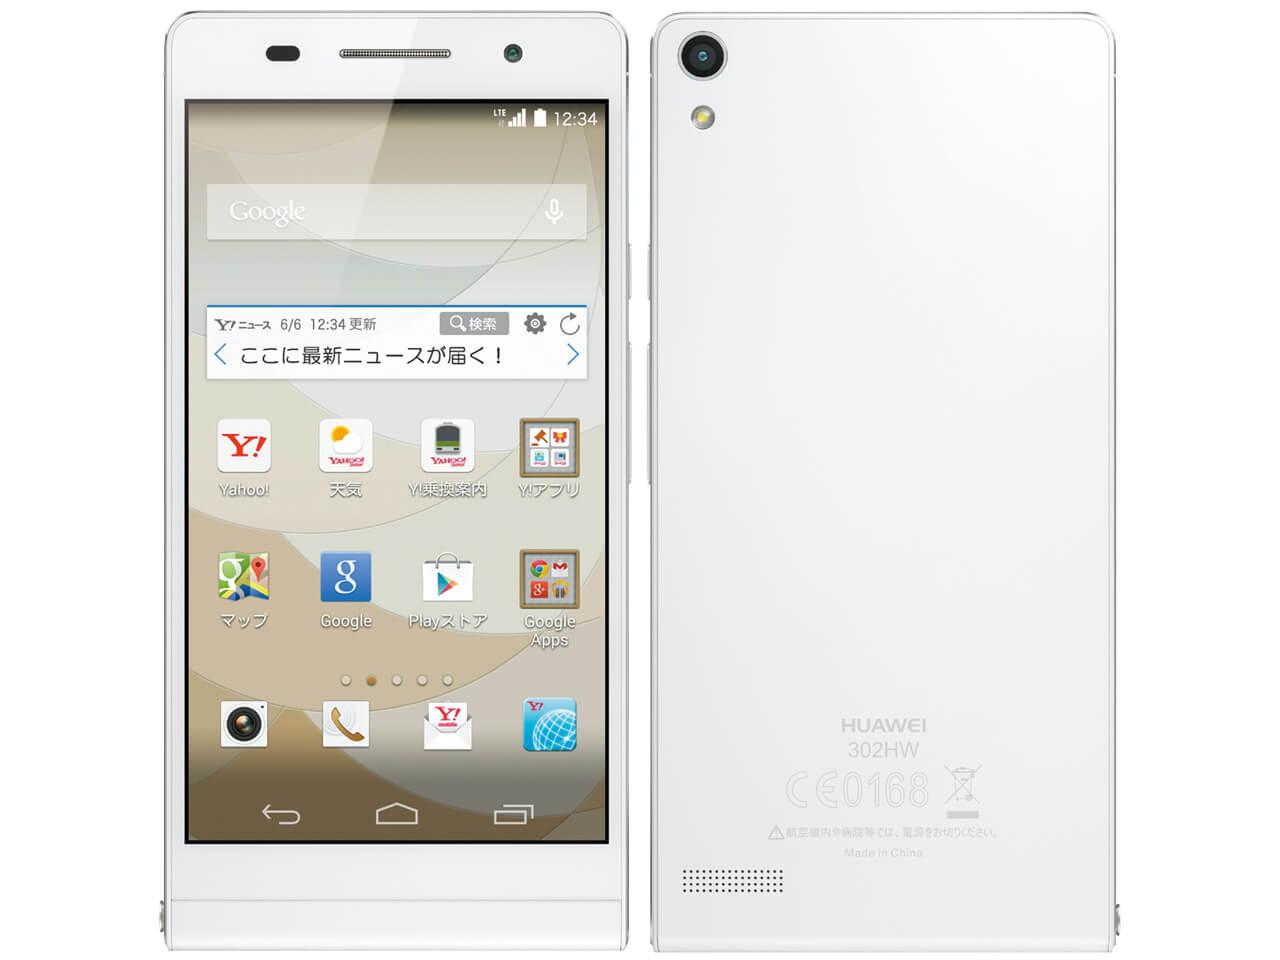 Y!mobile Huawei STREAM S 302HW